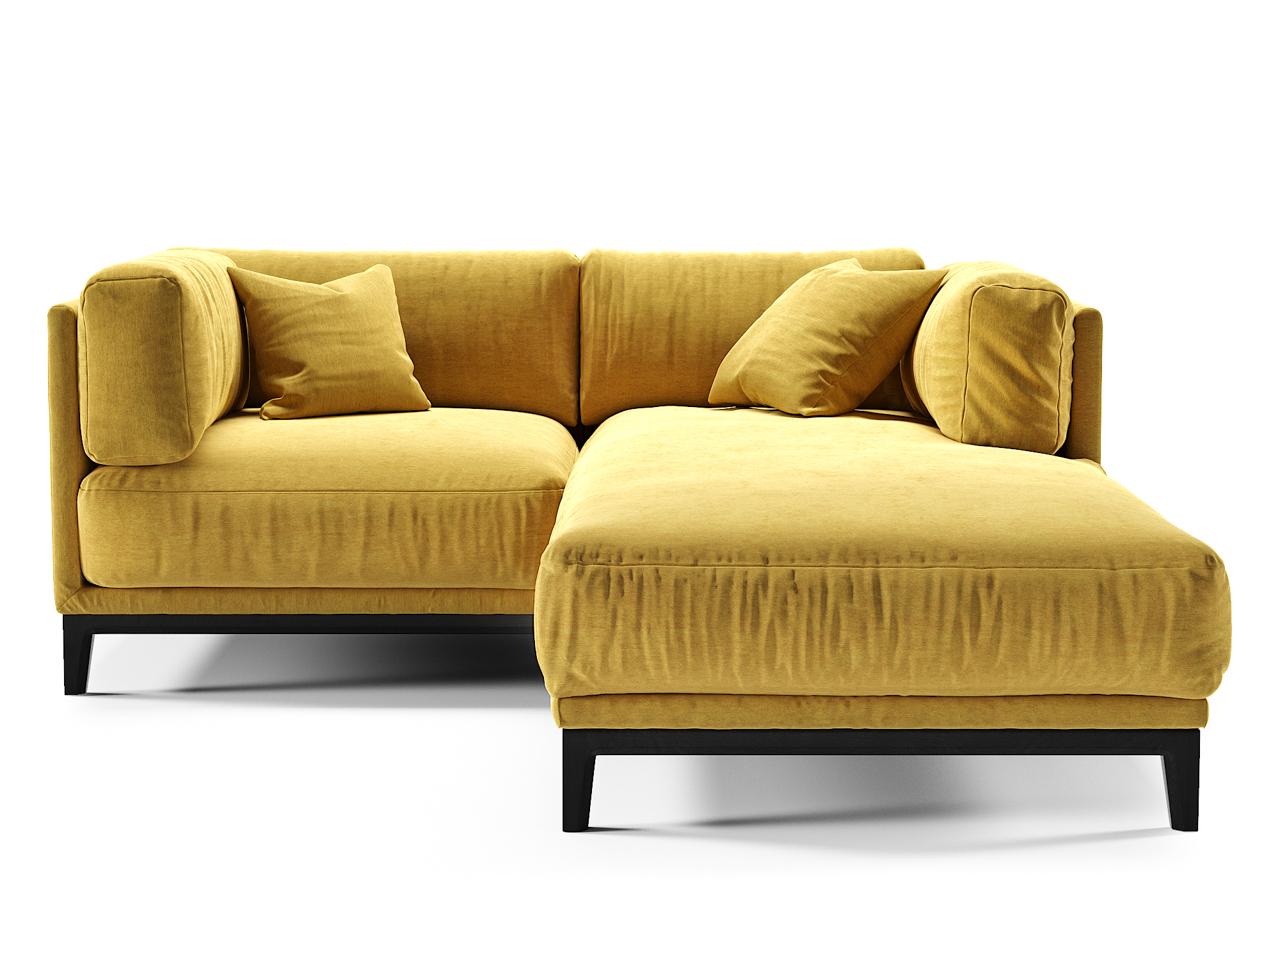 The idea диван case желтый 108287/1